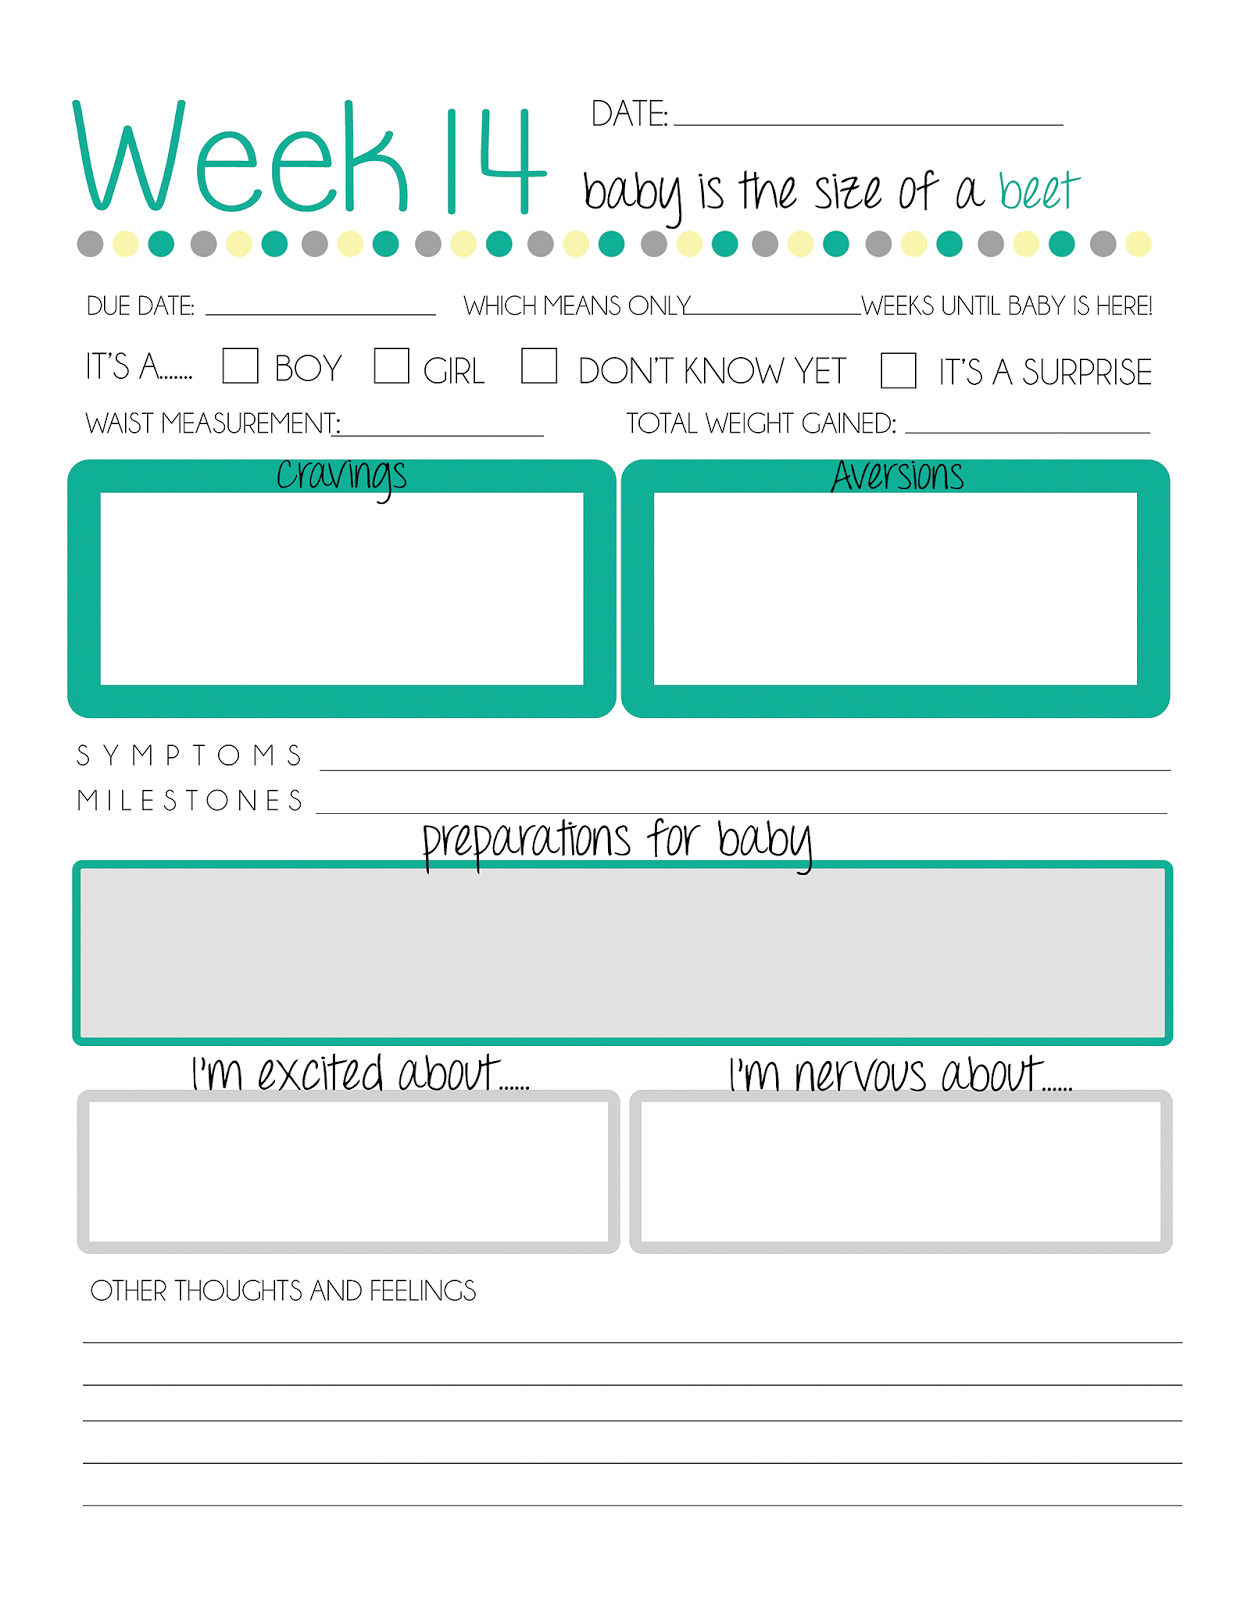 Free Printable Pregnancy Journal. | Brenda Breland Blog | Pregnancy - Free Printable Baby Journal Pages